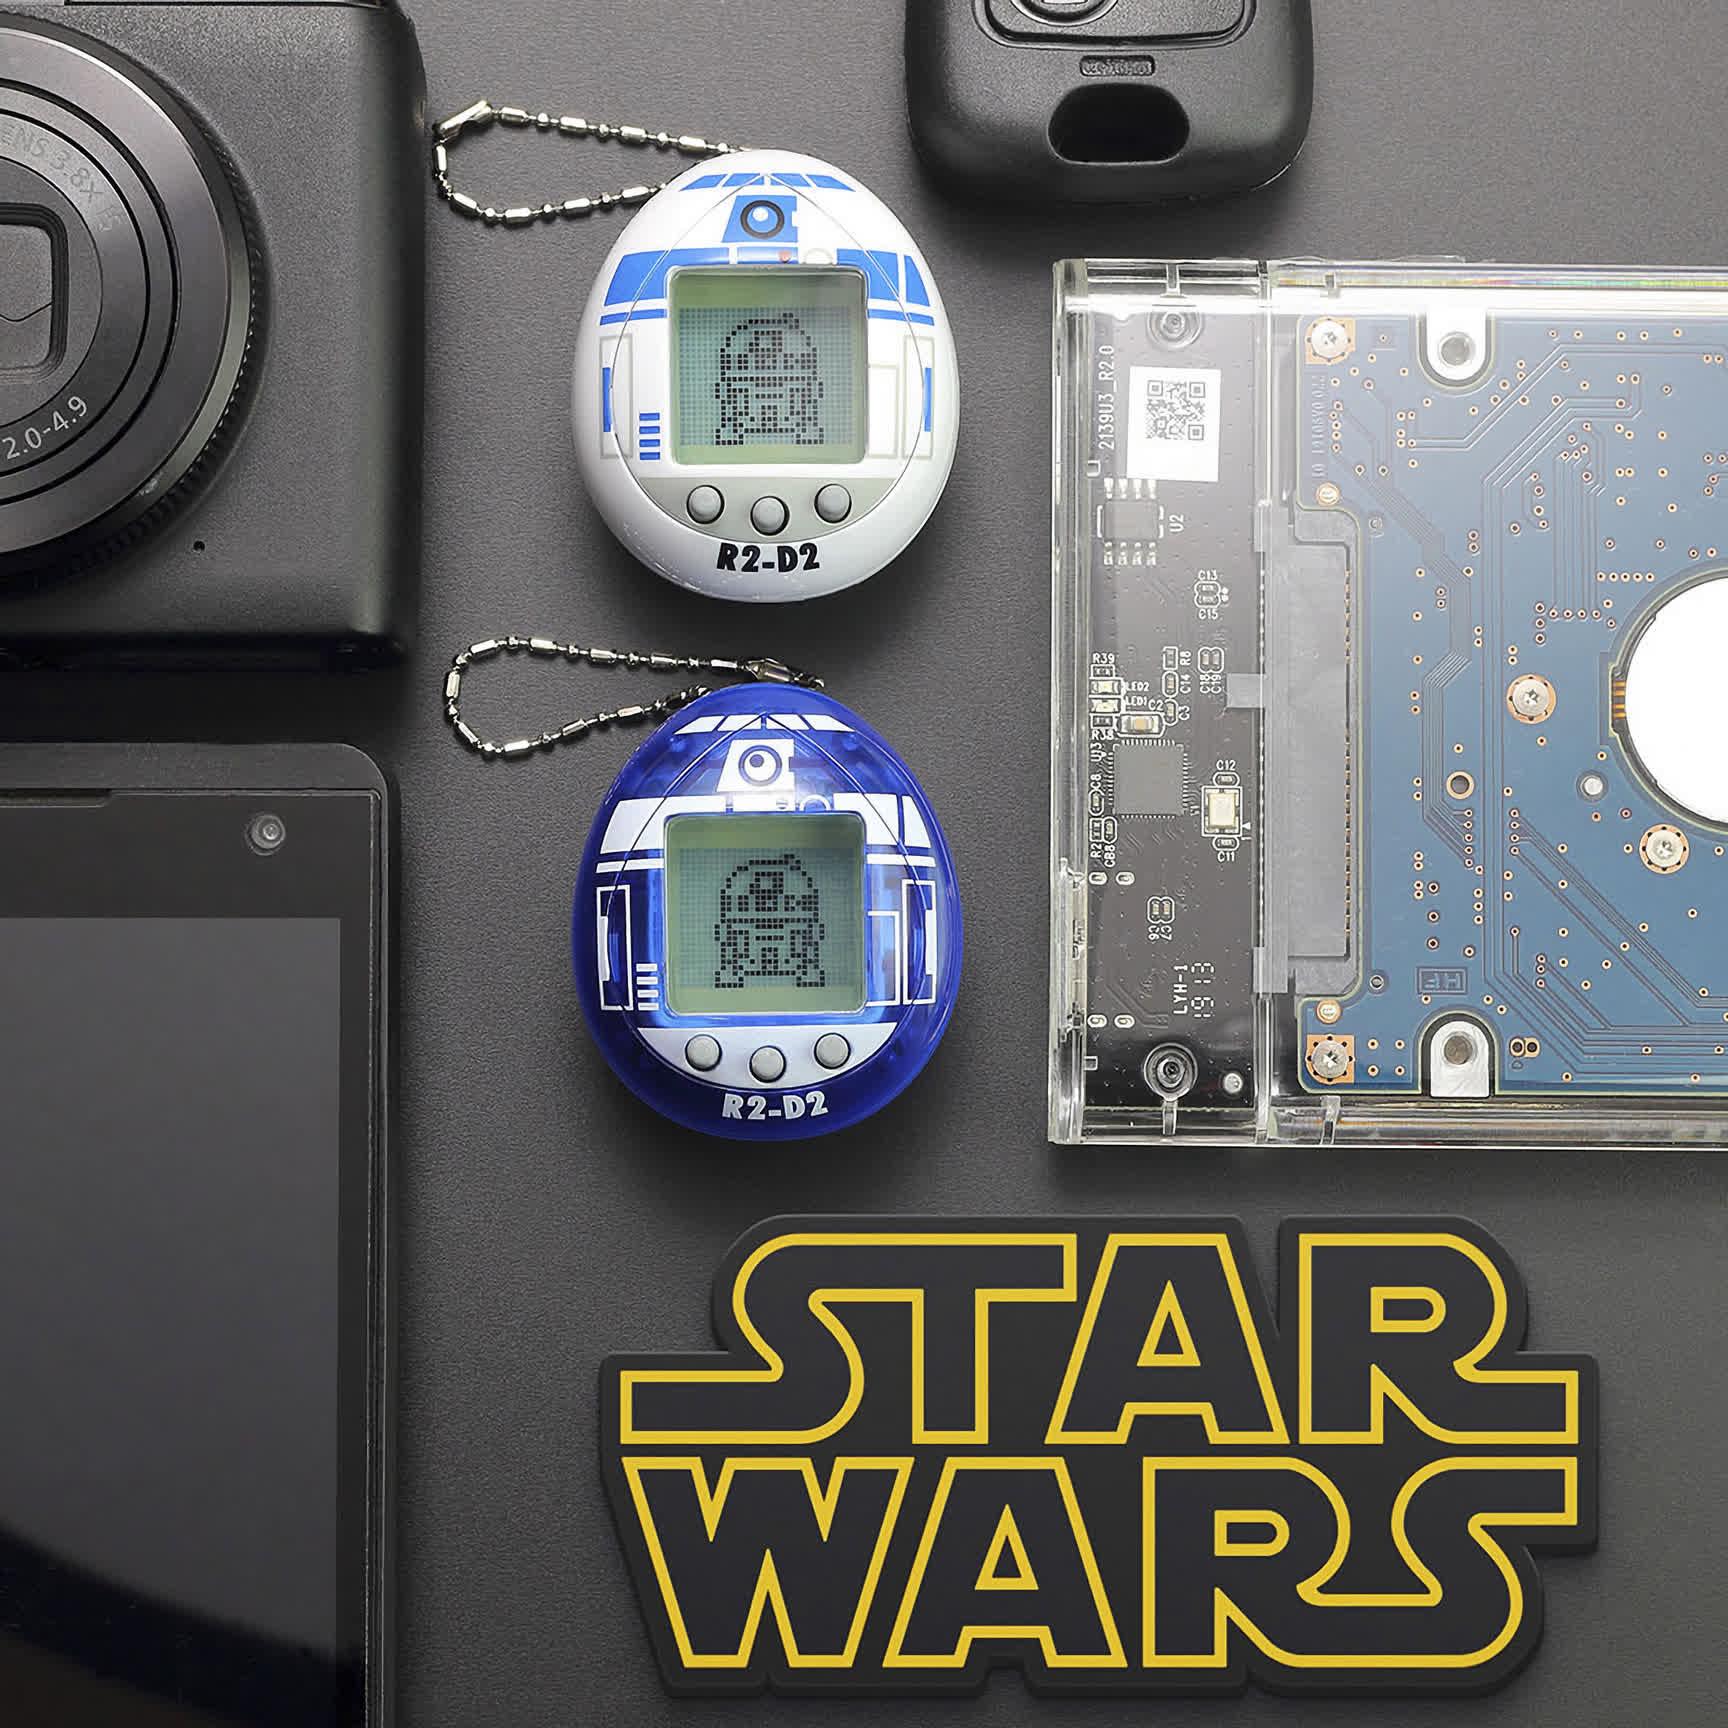 Tamagotchi turns Star Wars' R2-D2 into a virtual pet 17